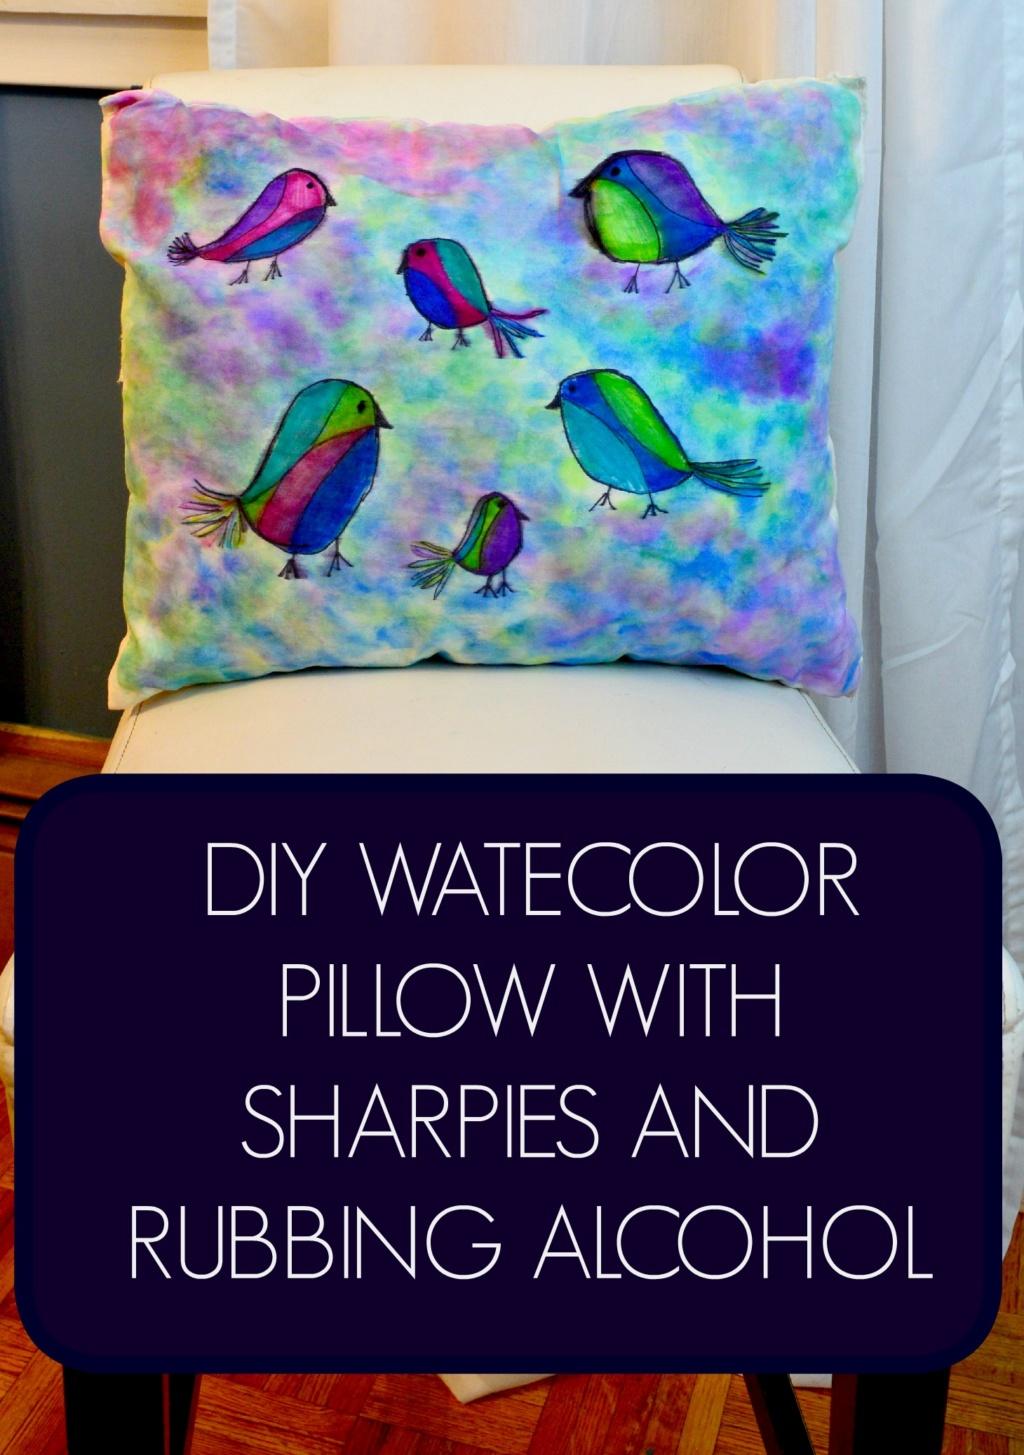 DIY Watercolor Sharpie Pillow